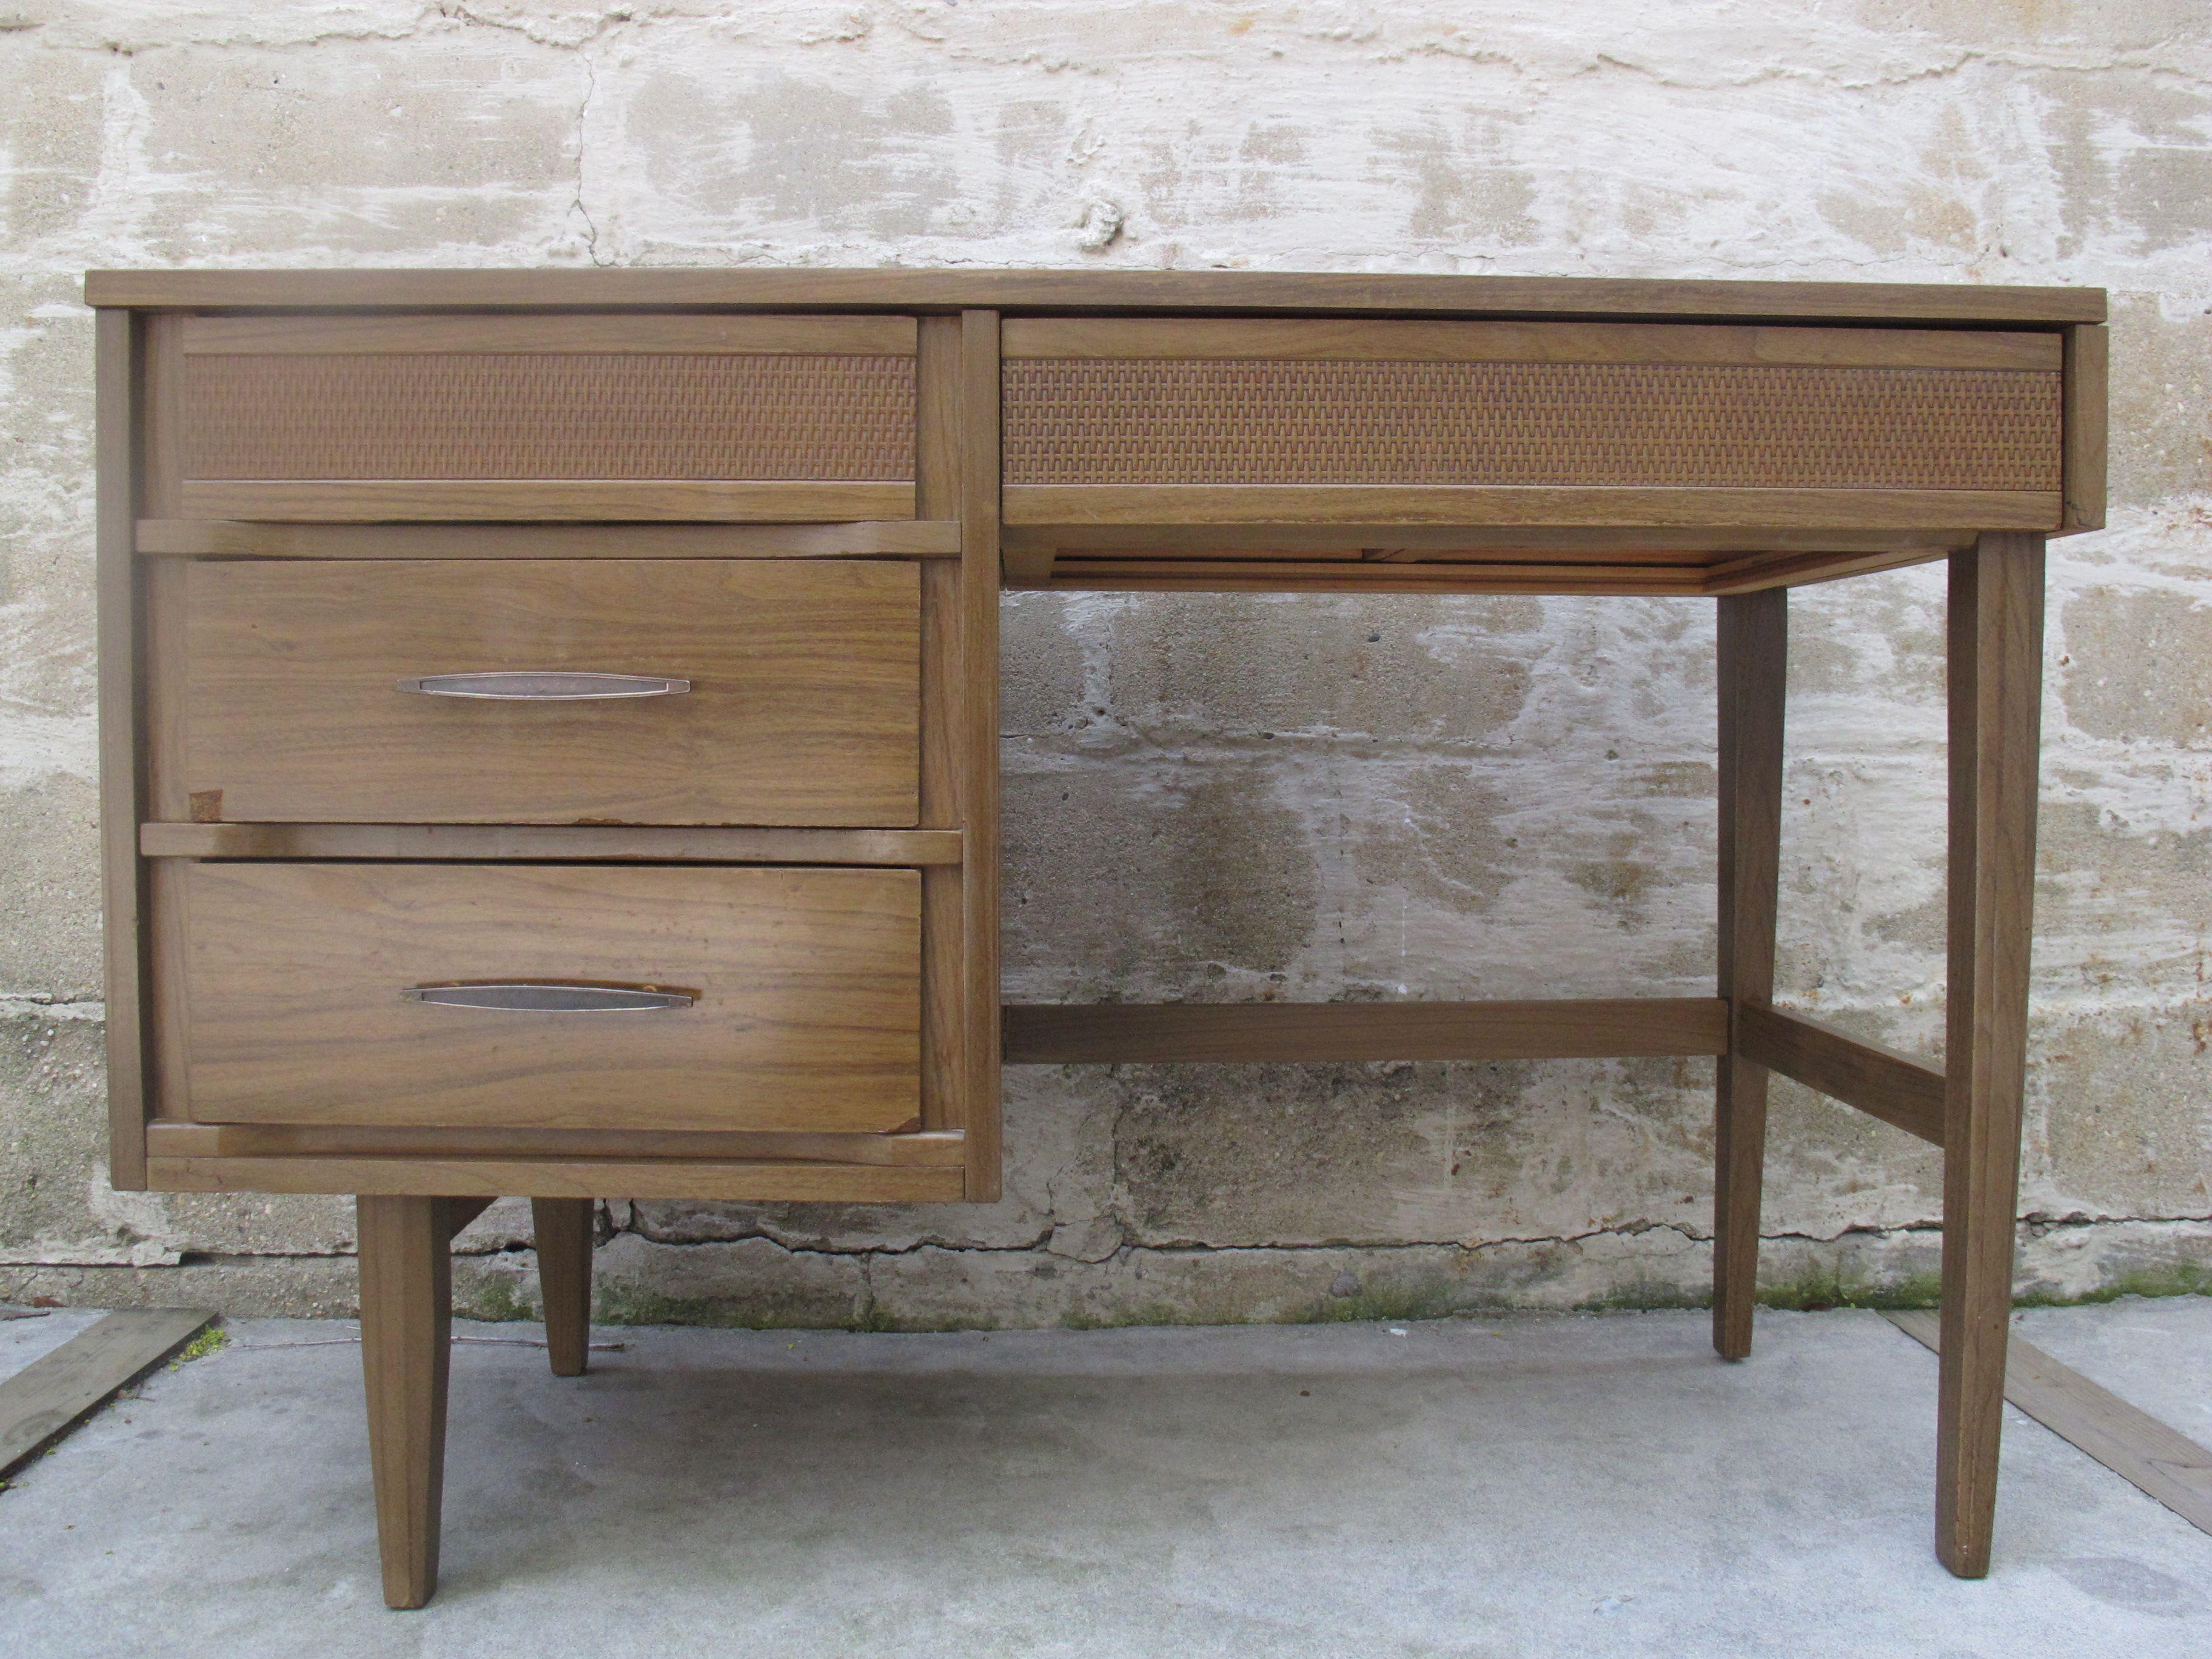 Mid Century Modern Desk By Kroehler Sold Items Adverts Vintage